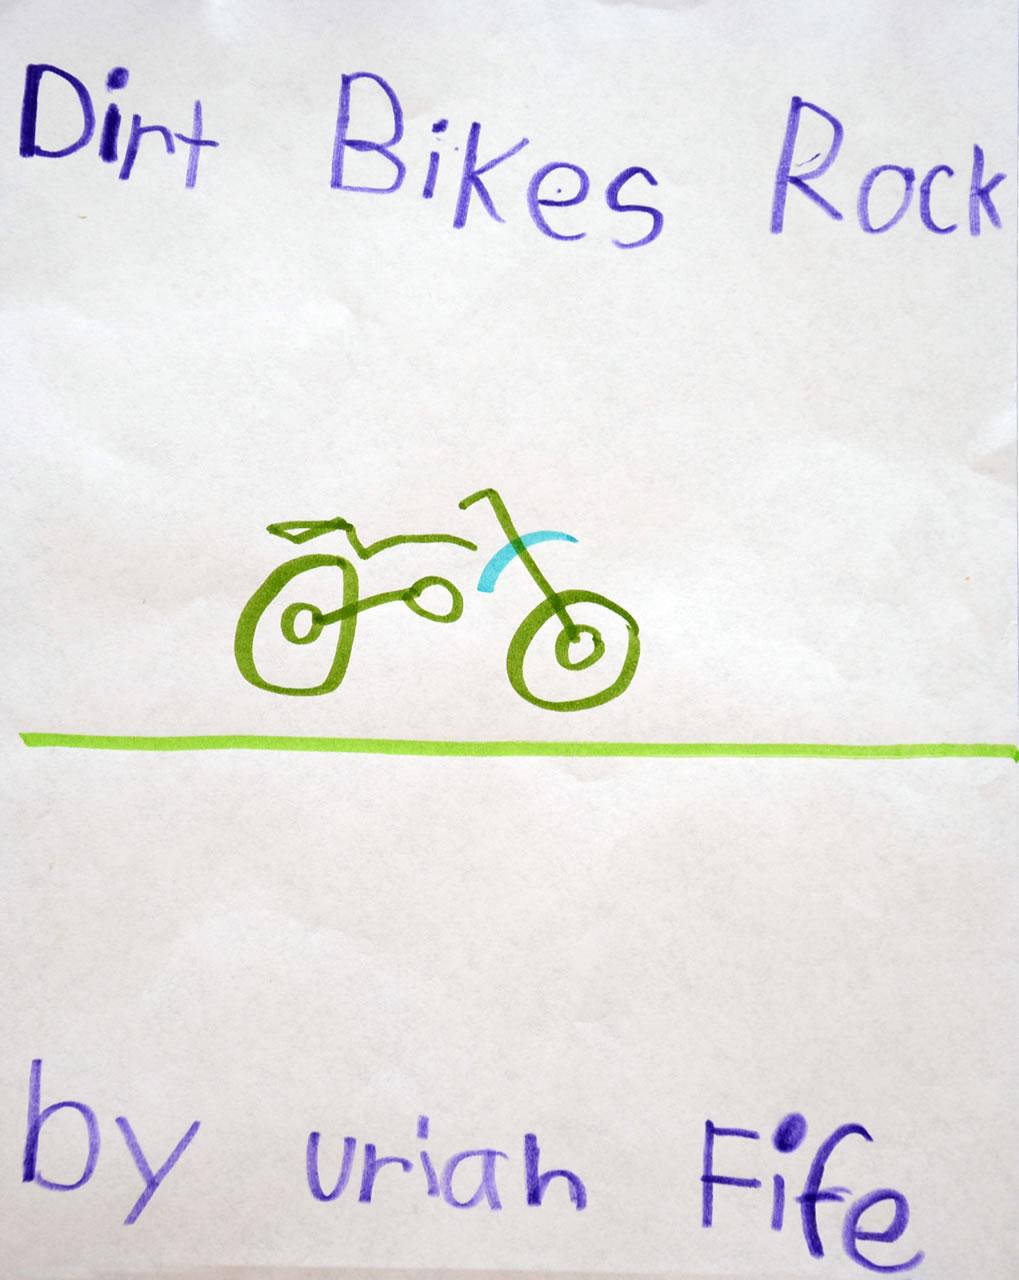 DirtBikesRock_01